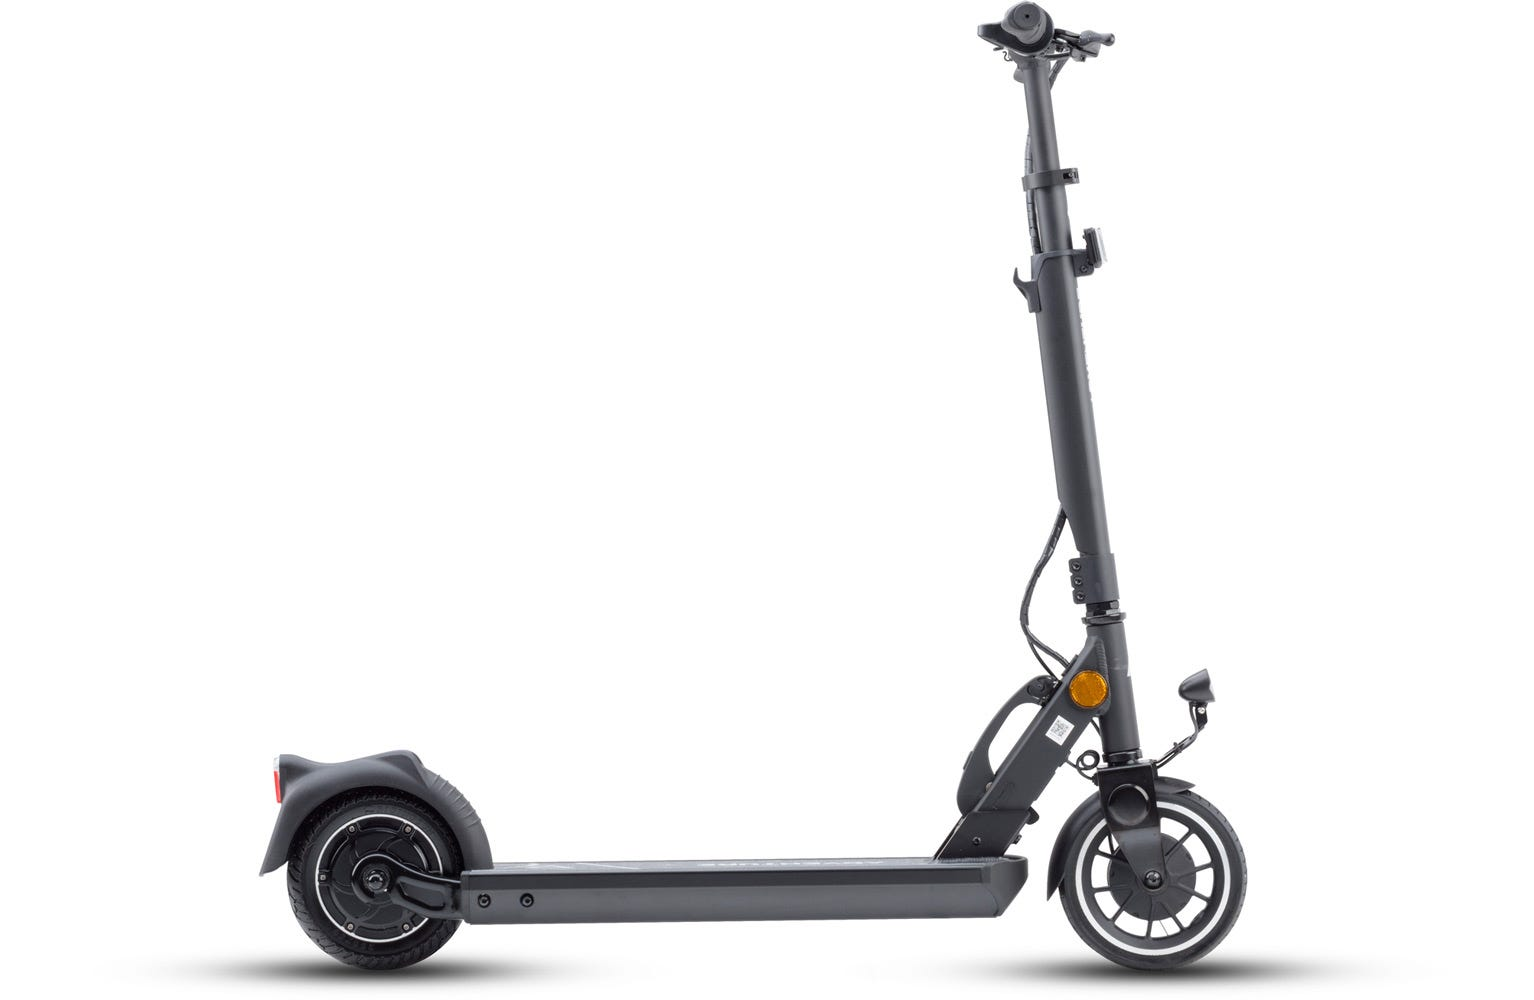 Adventure E-Scooter